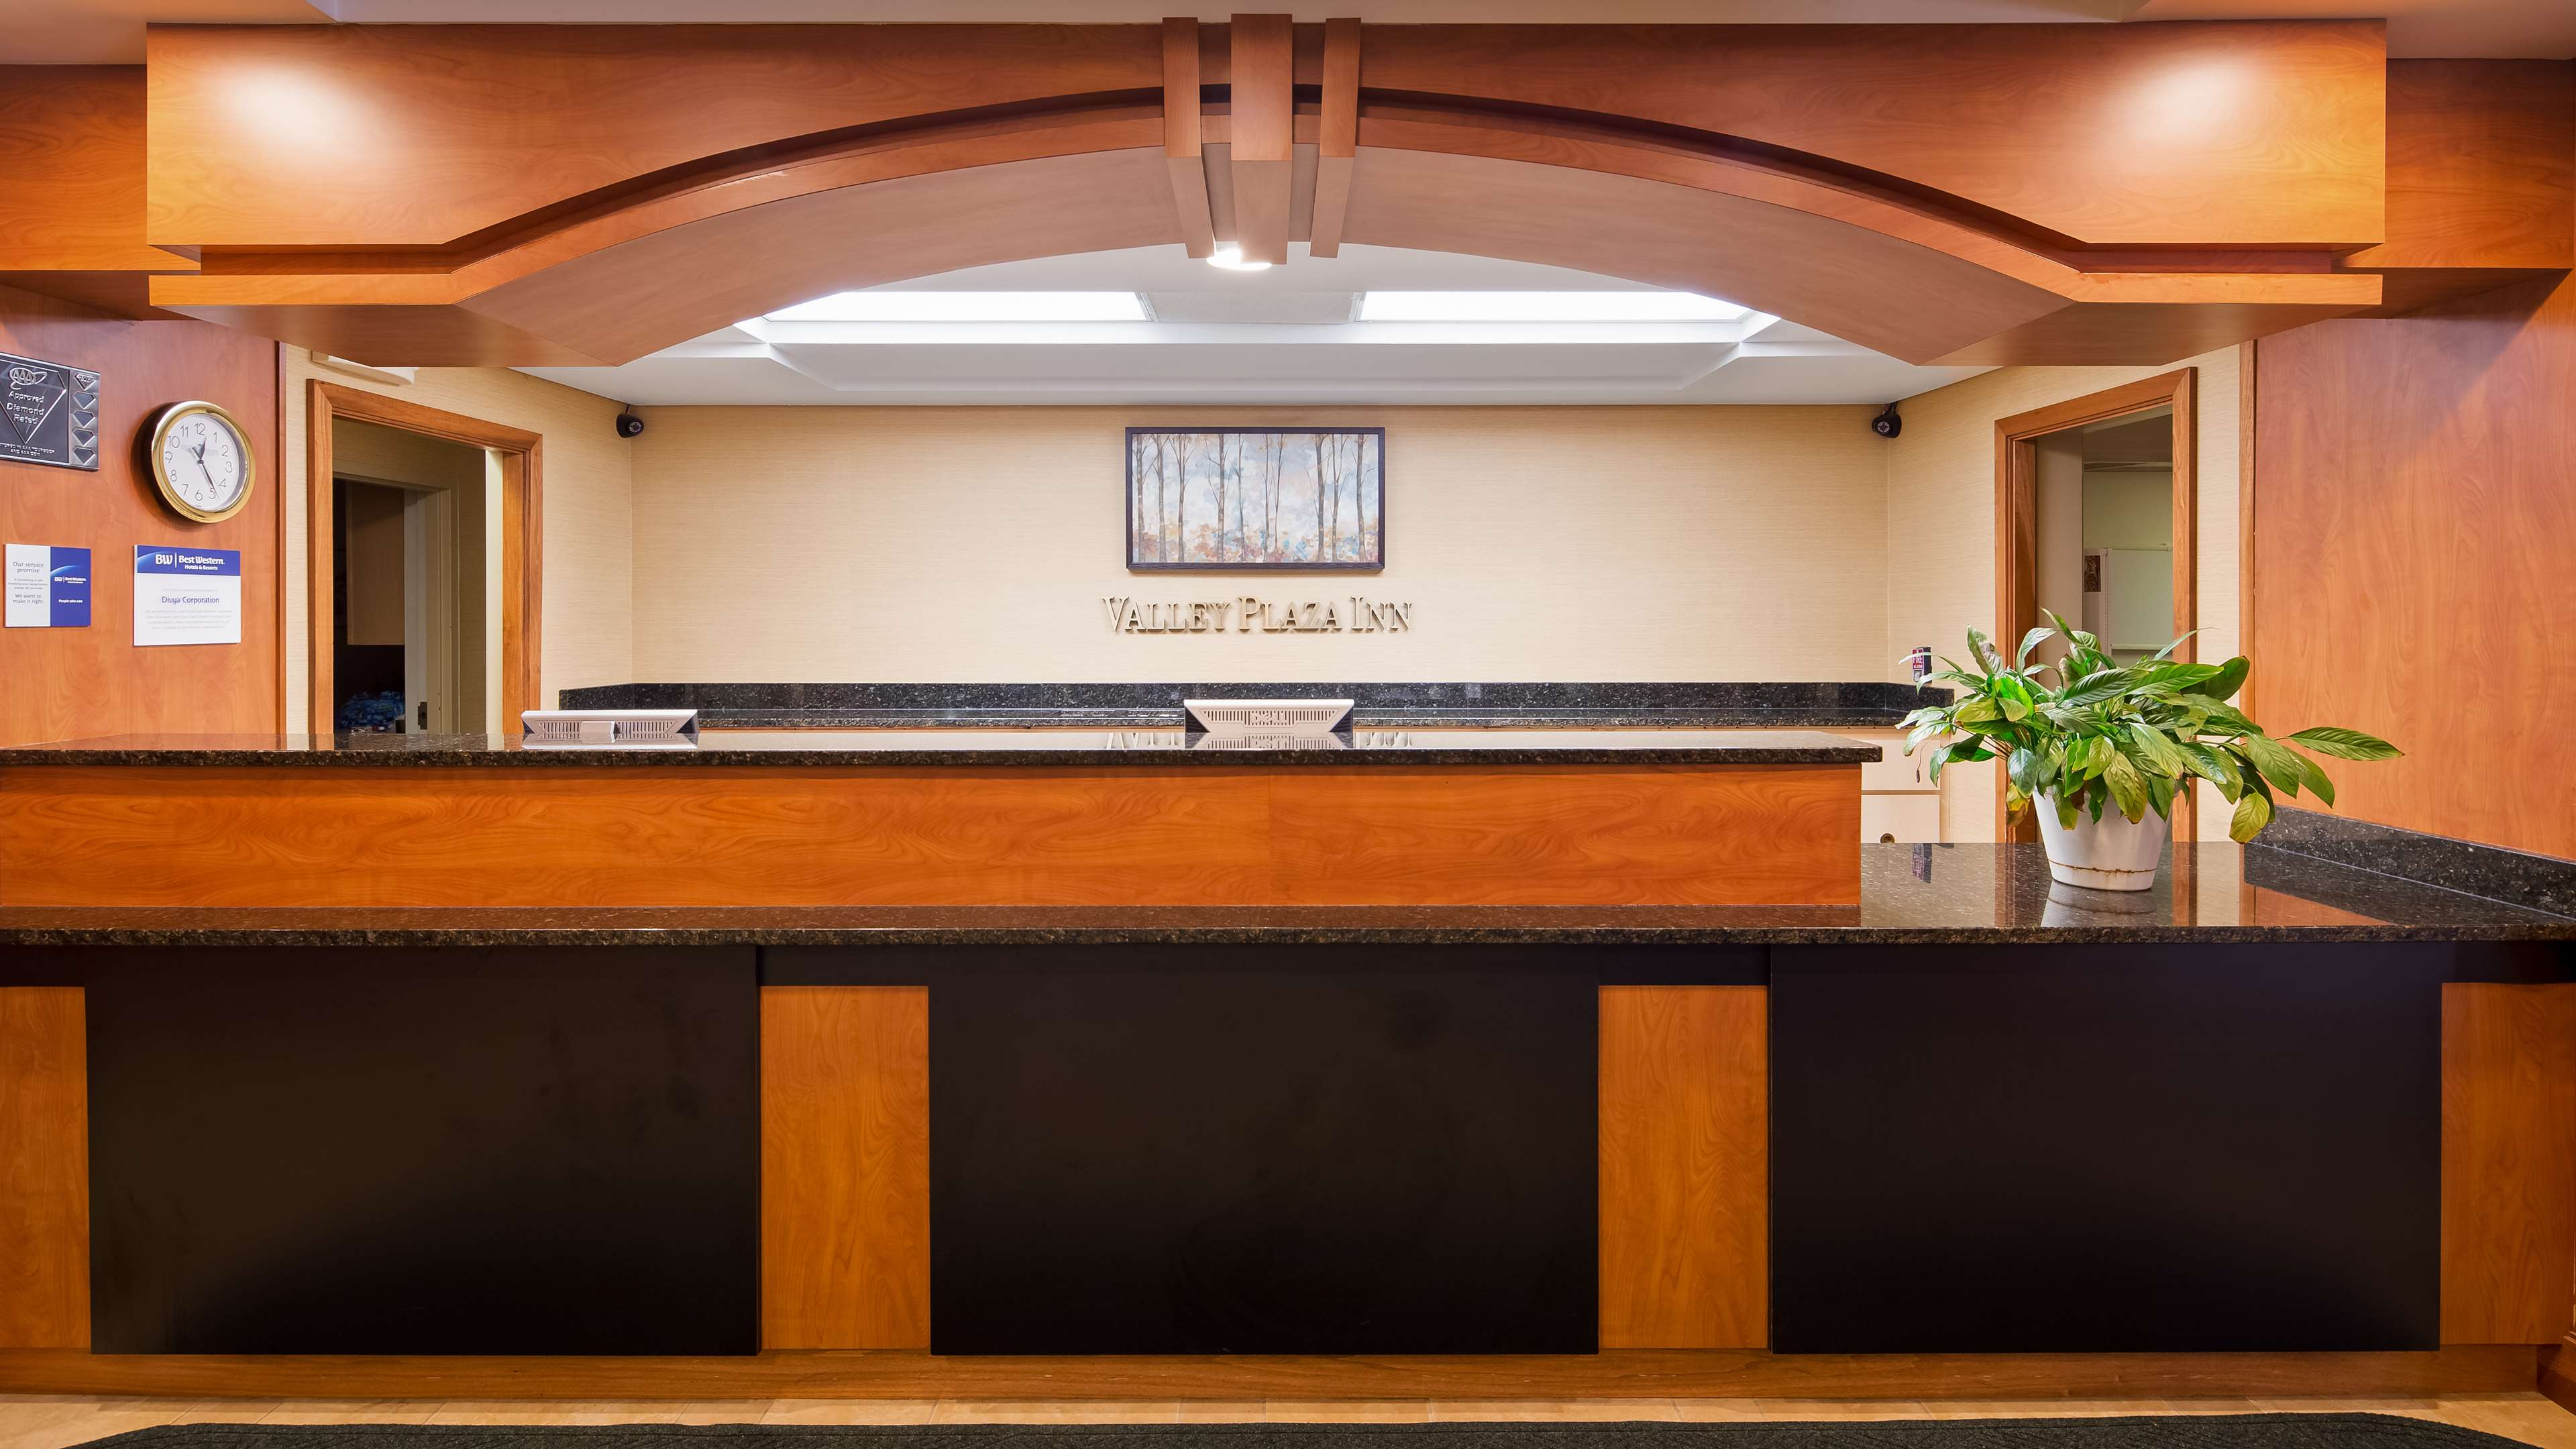 Best Western Valley Plaza Inn image 5